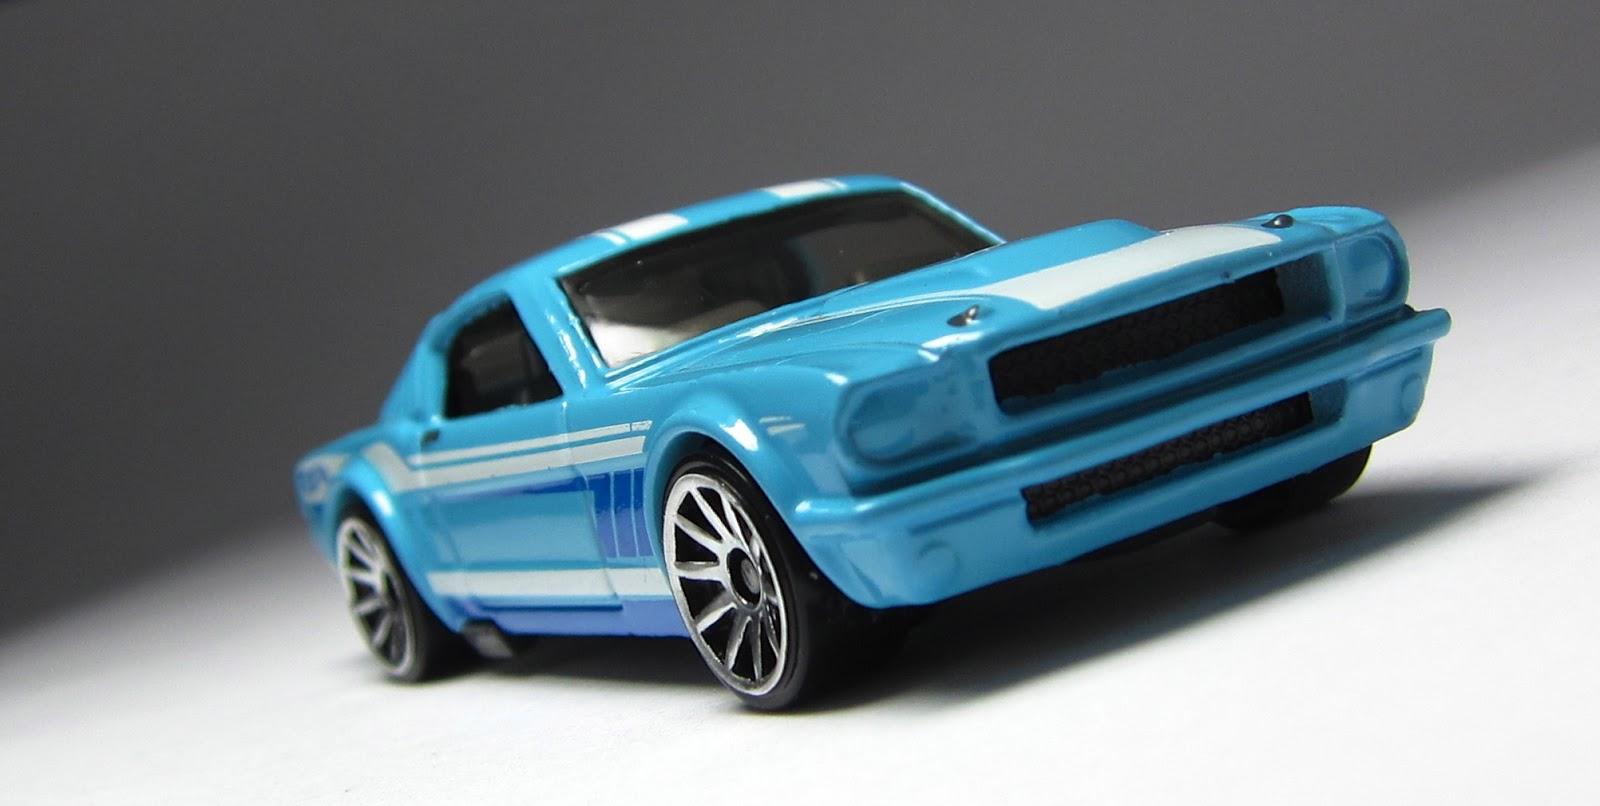 1978 Ford Mustang also prar Zapatos De Vestir De Tacón Para Mujer Zapatoria furthermore Hot Wheels 65 Mustang Fastback also Daphne Blue Fender Mustang Guitar further 65 Chevy Truck Wheels. on 65 mustang blue